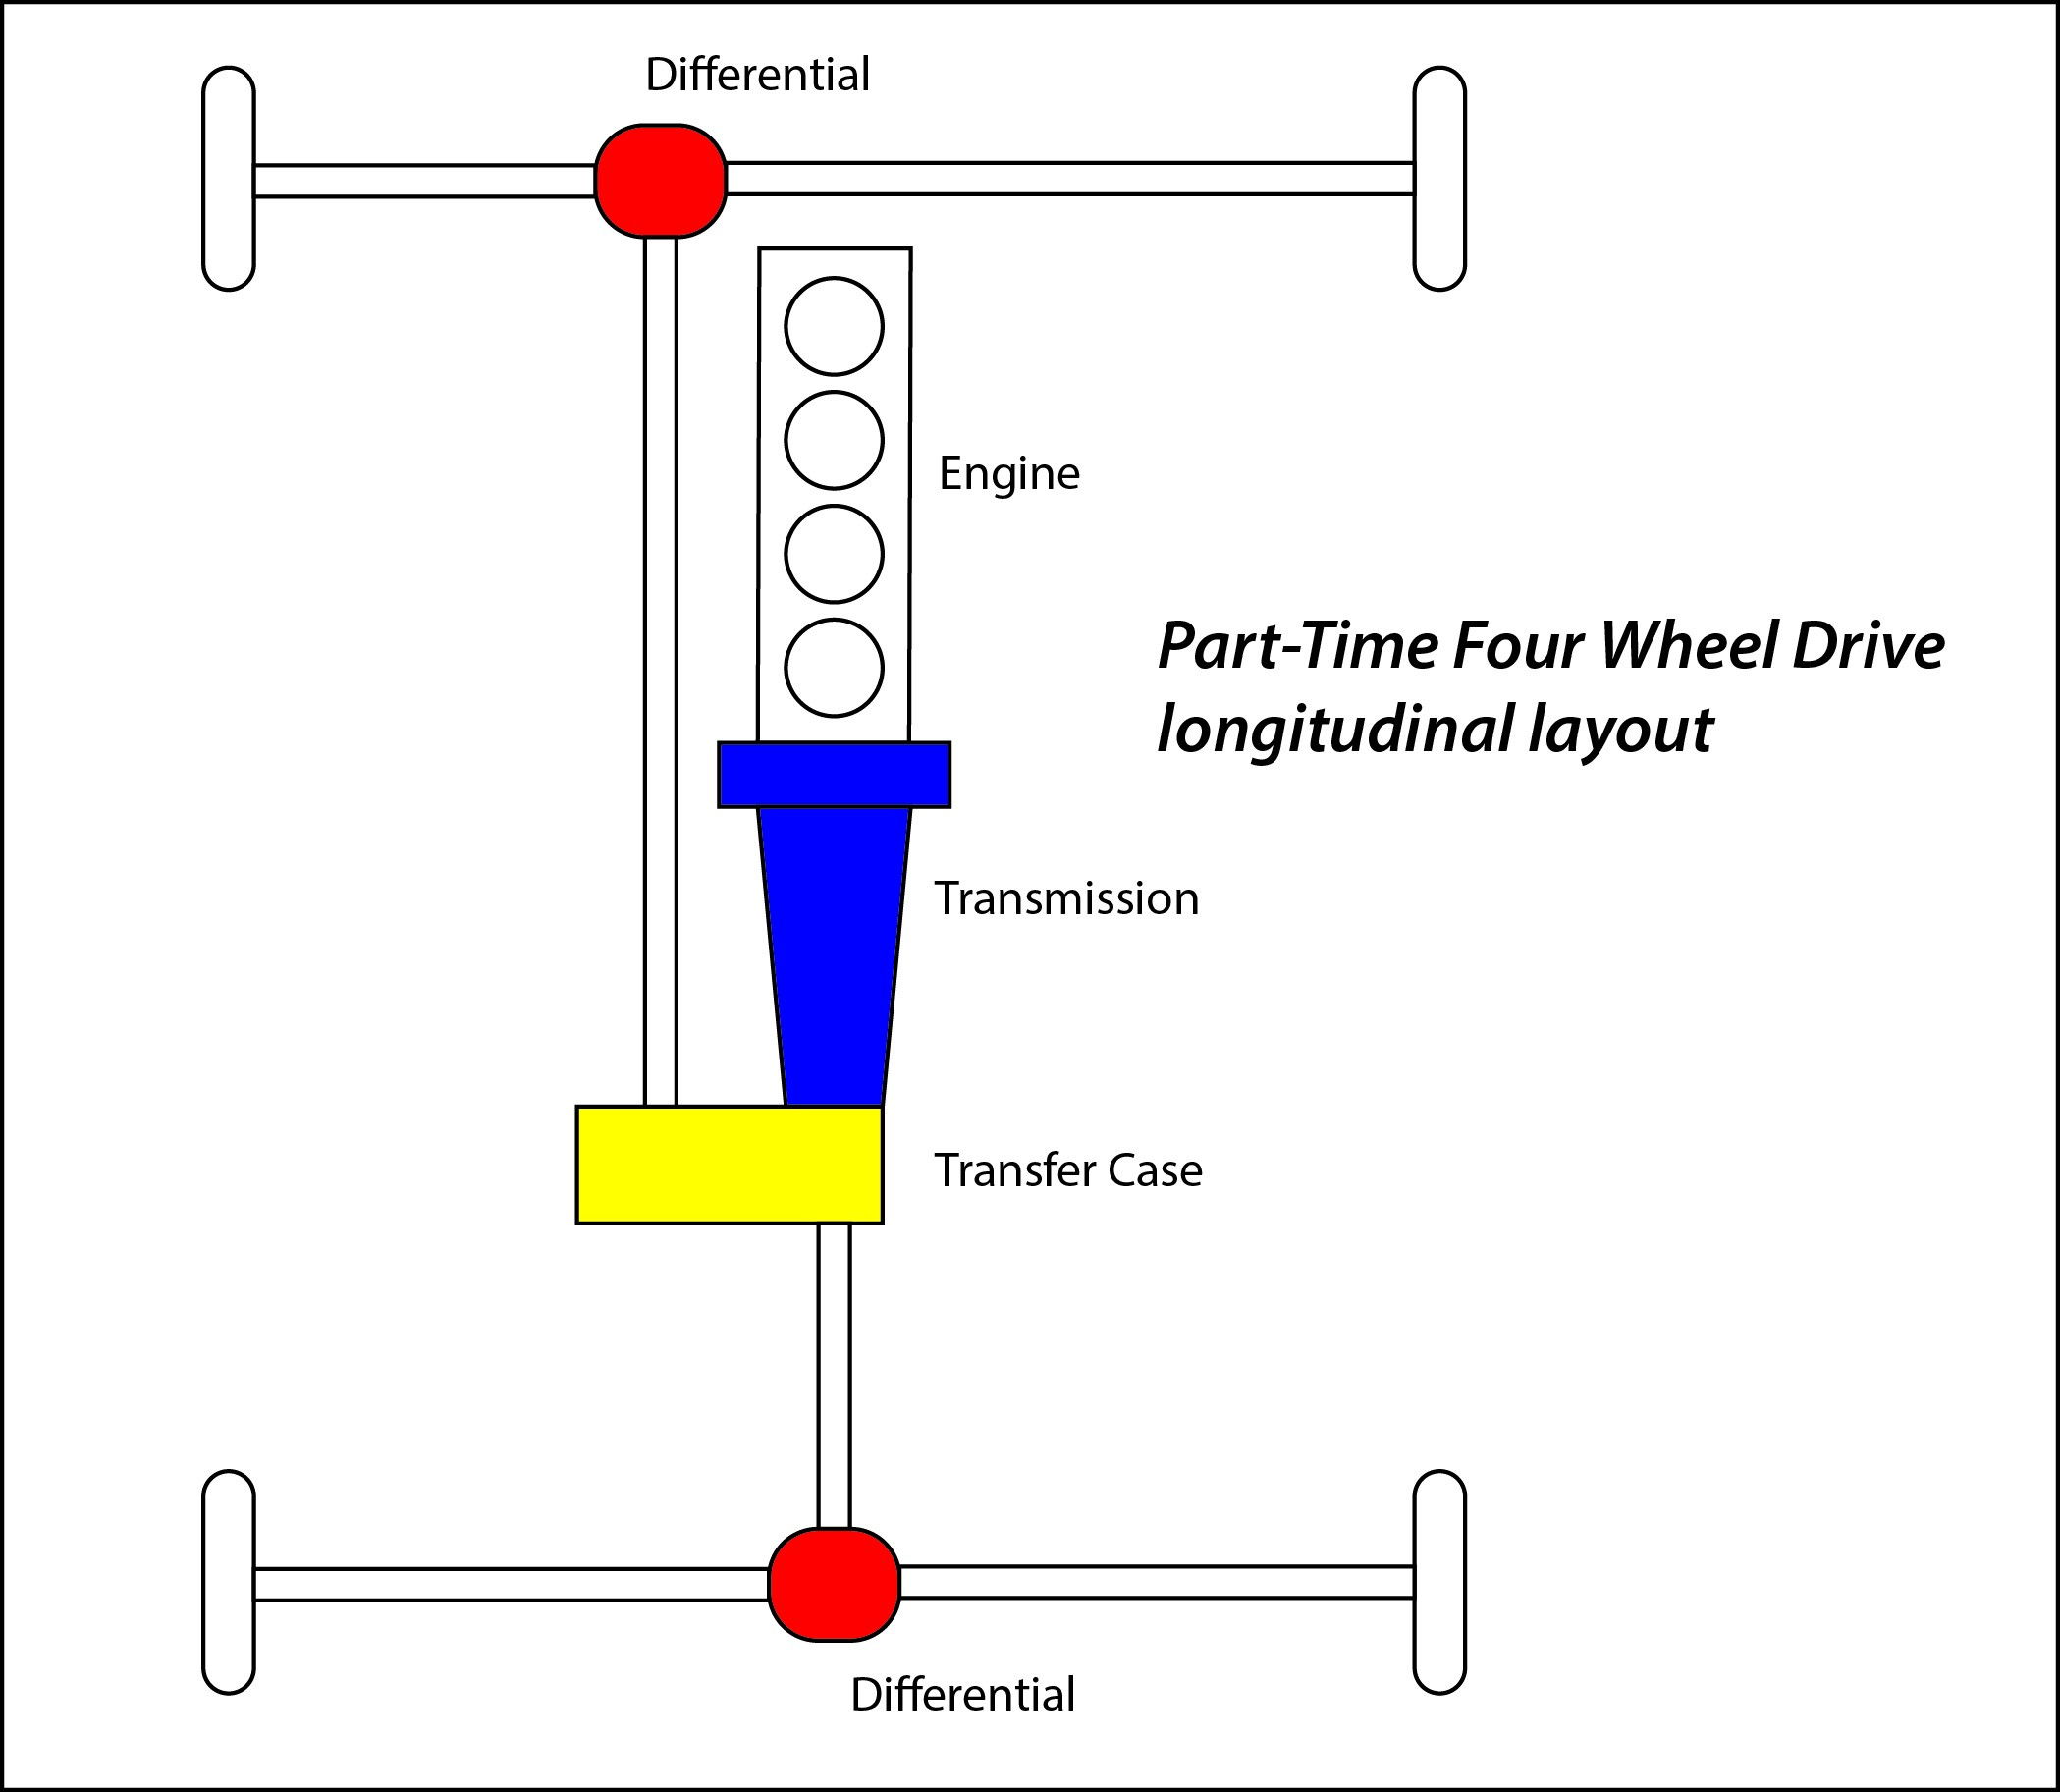 Drivetrain Diagram 4wd Drivetrain Diagram 4wd Alphabet soup 4×4 Vs 4wd Vs Awd where S the Of Drivetrain Diagram 4wd